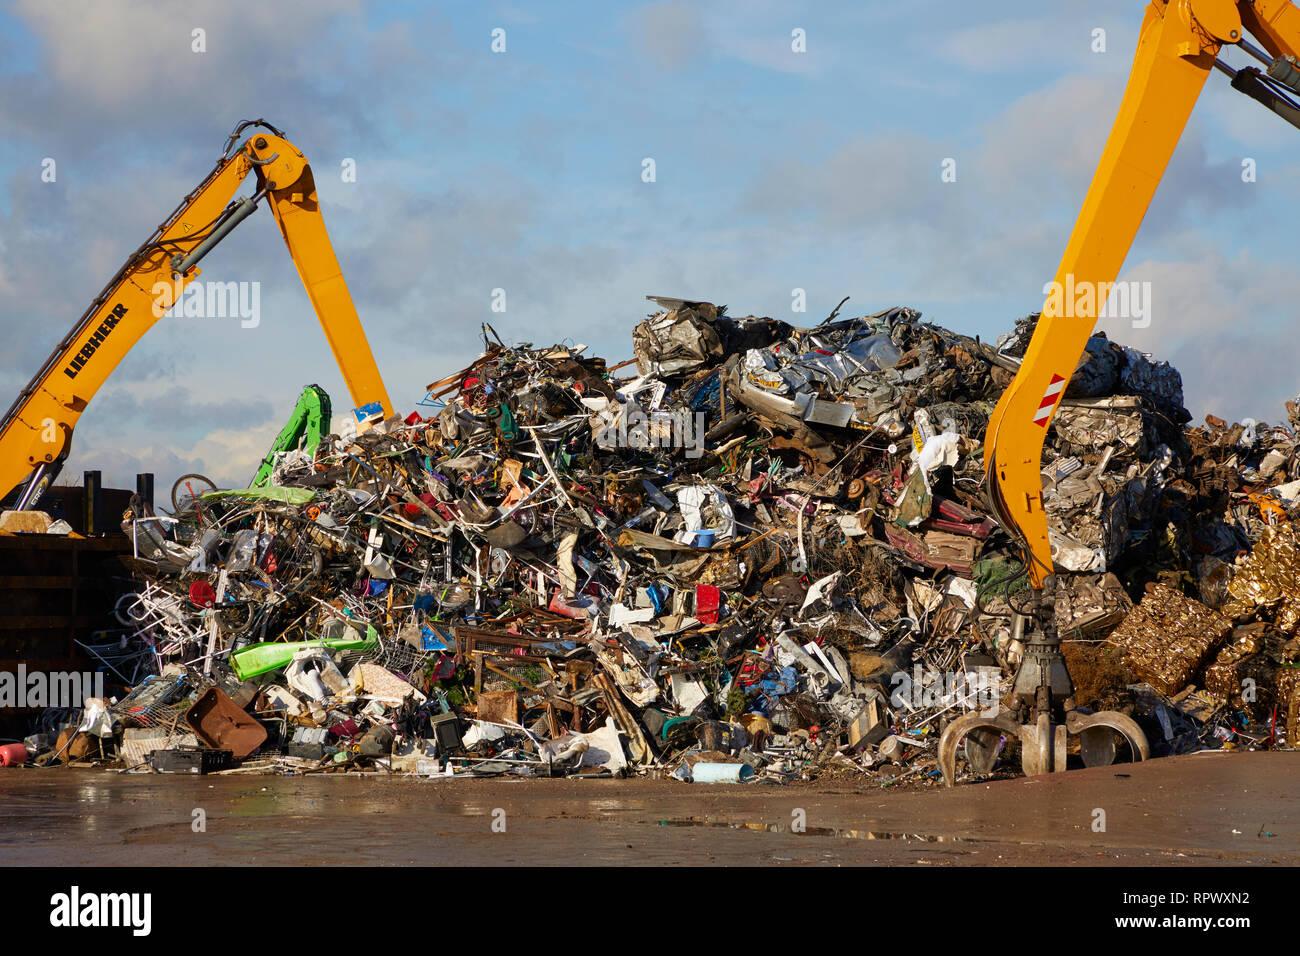 A metal recycling yard. Stock Photo